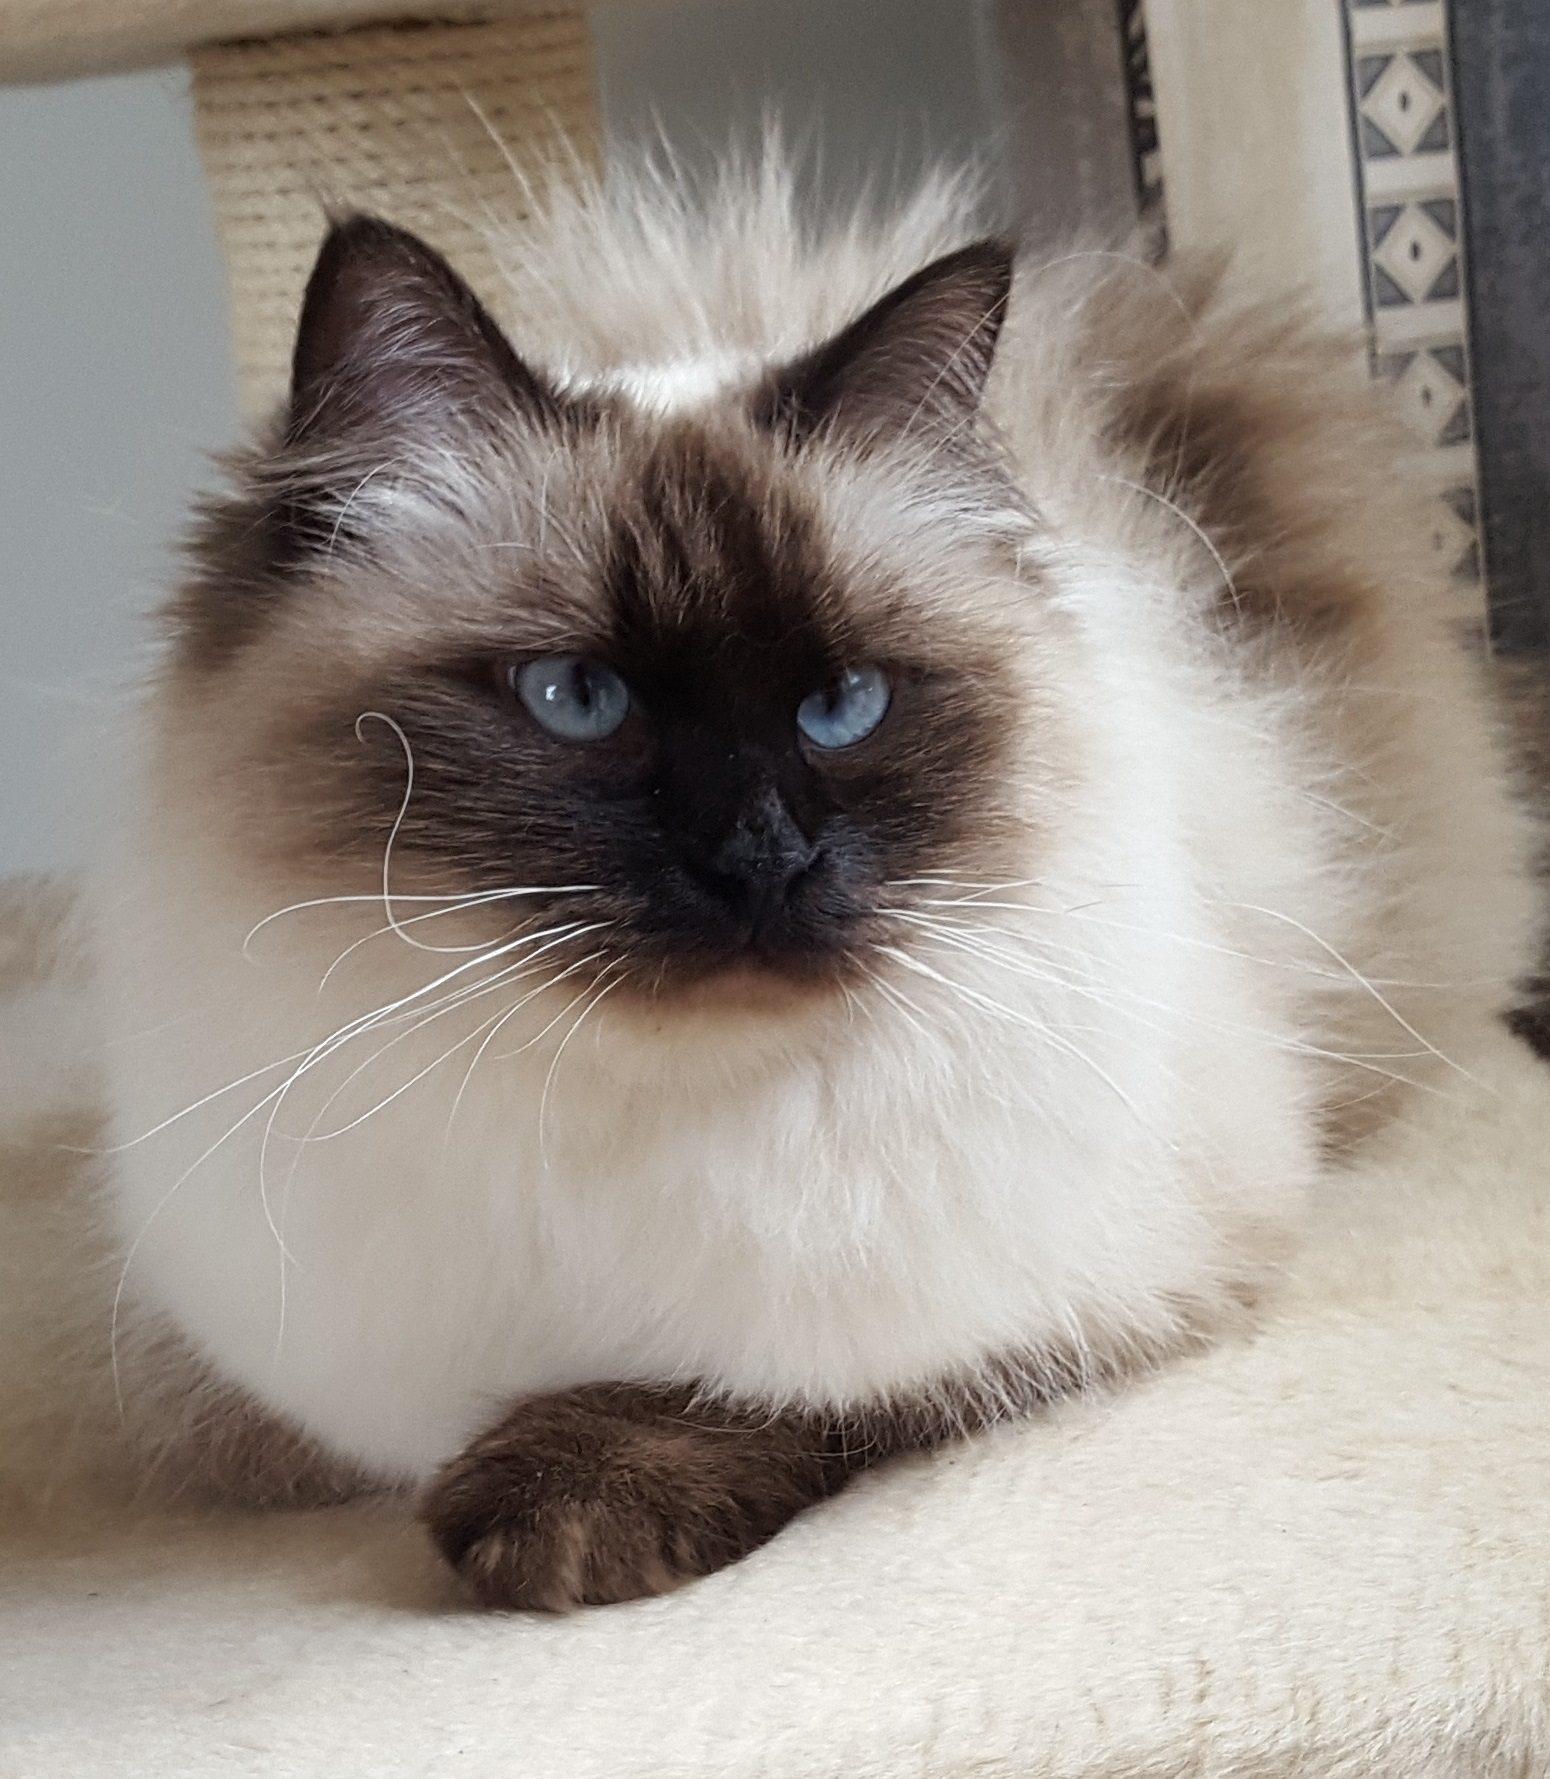 Koty Rasy Neva Masquerade Kup Kota Z Naszej Hodowli Małe Białepl